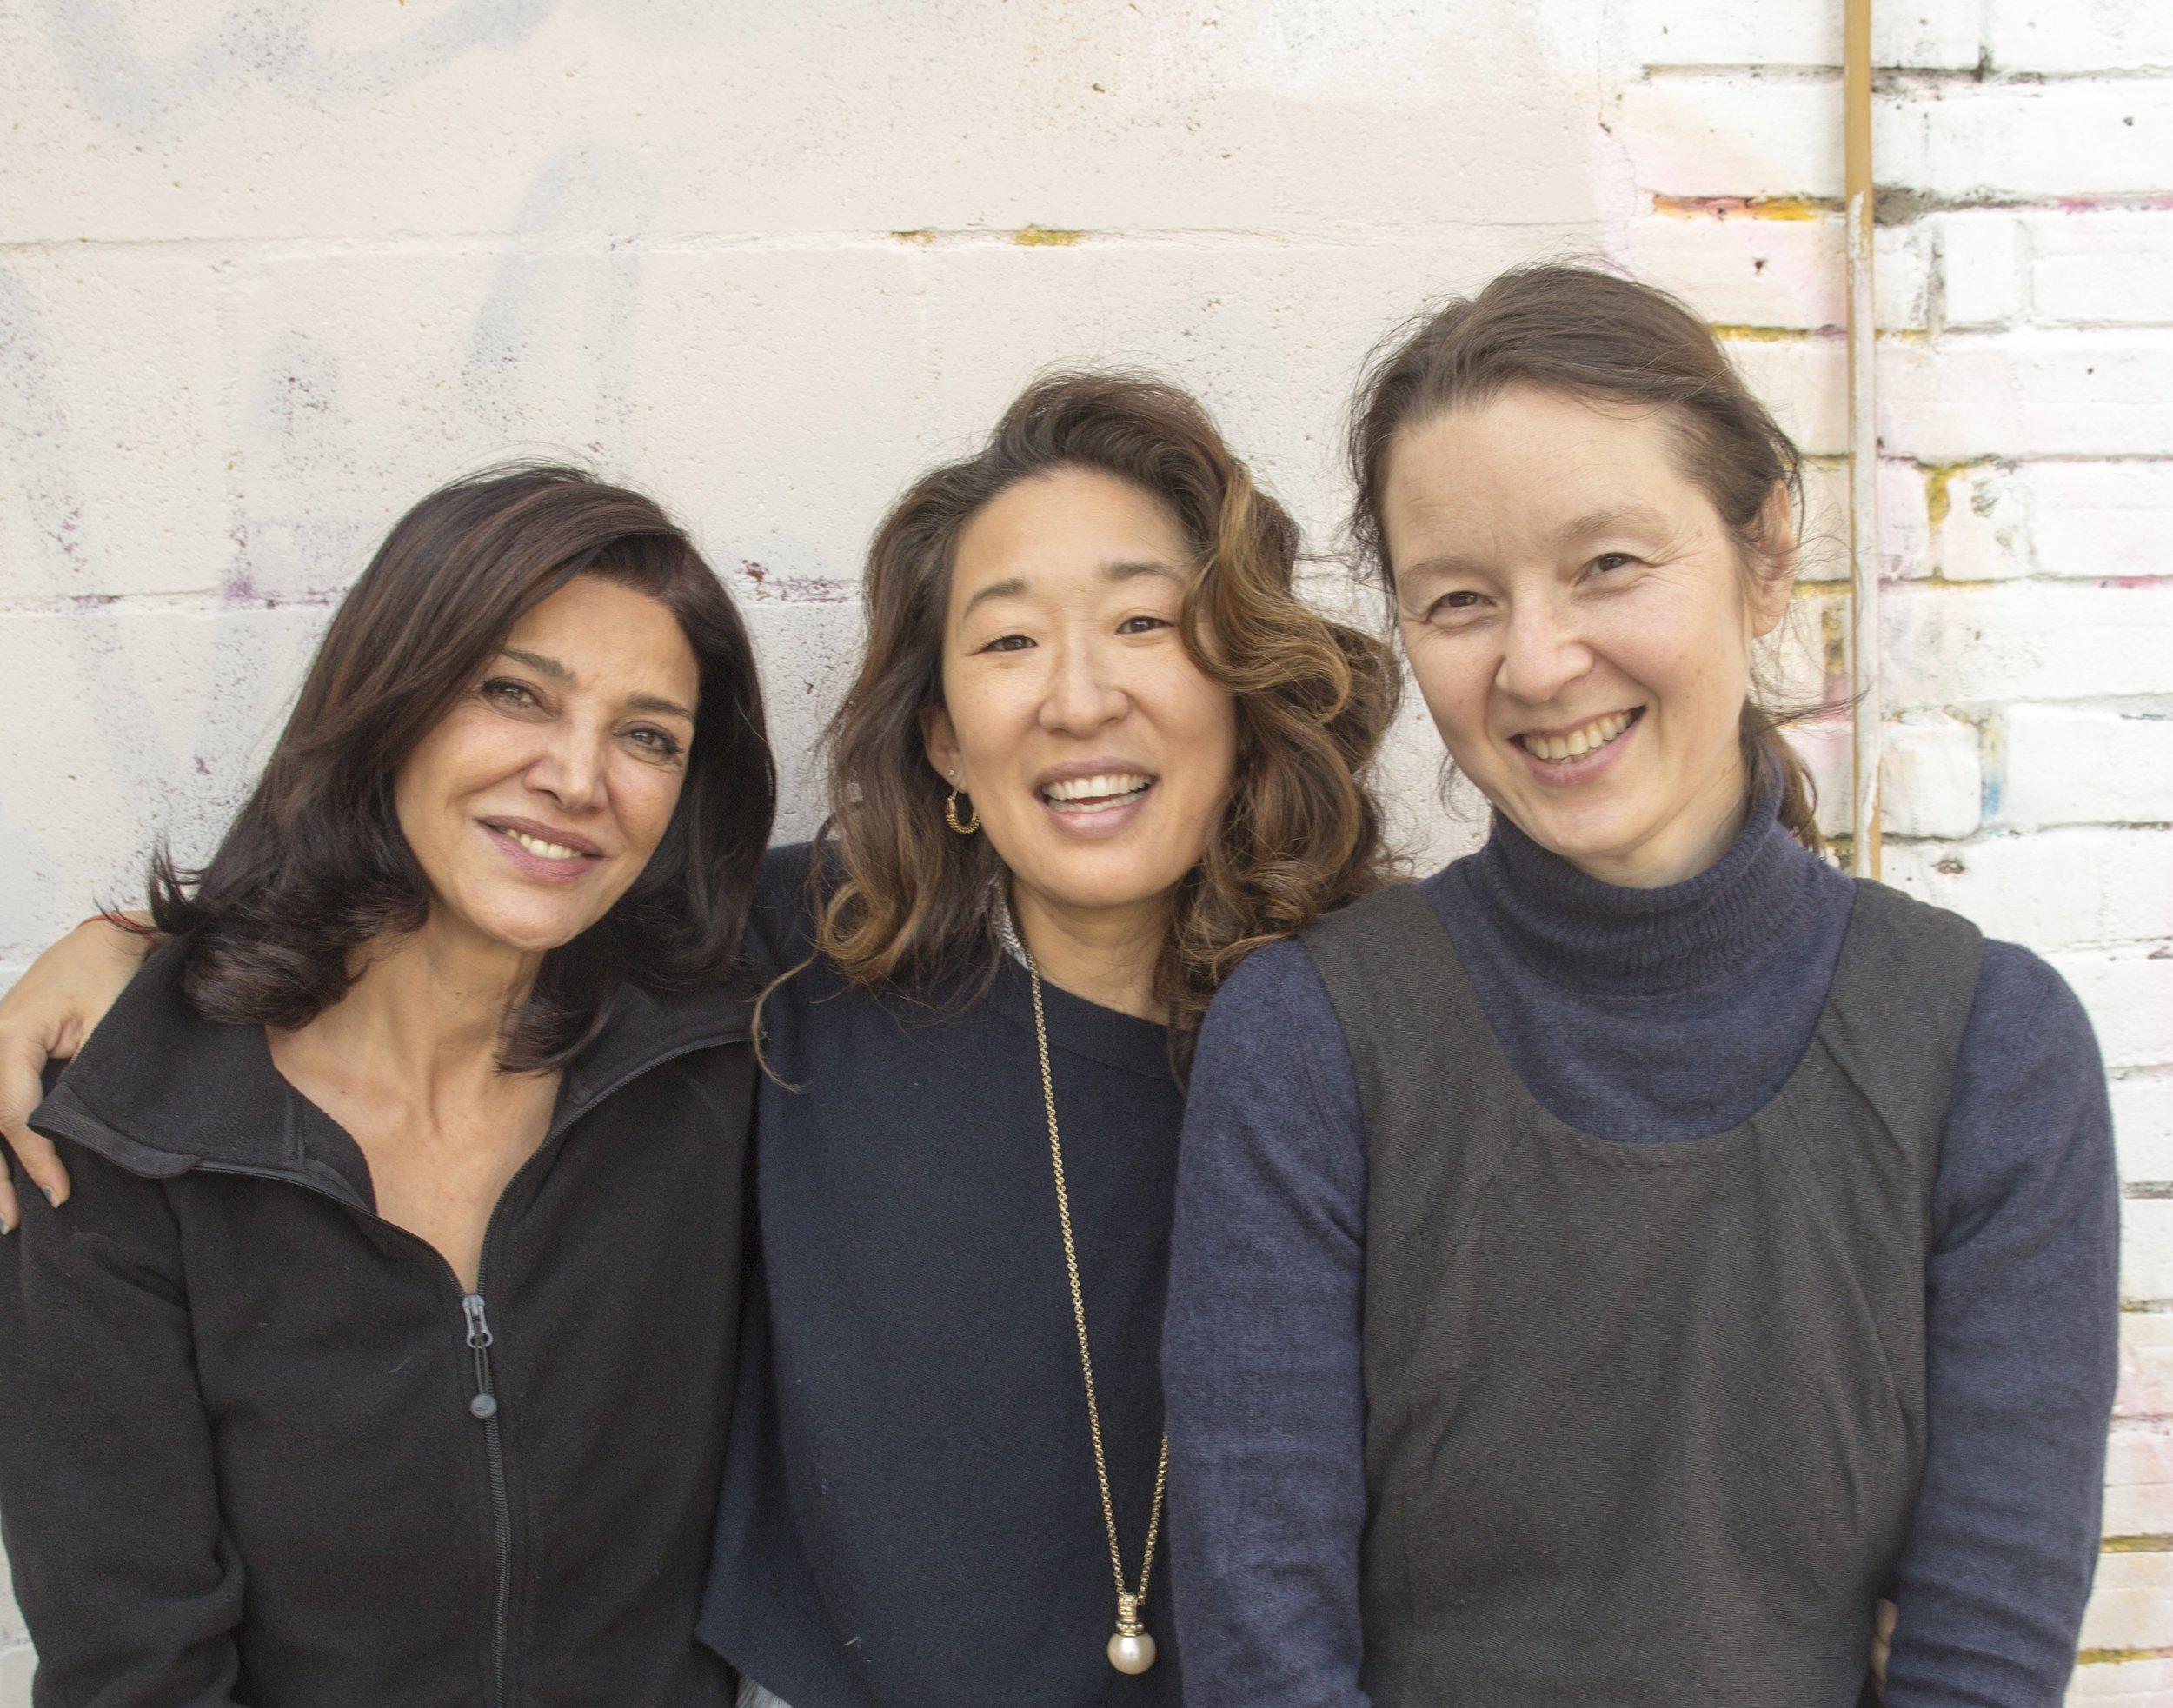 Shohreh Agdashlloo, Sandra Oh, and Ann Marie Fleming, outside The Dark Studio, Toronto.